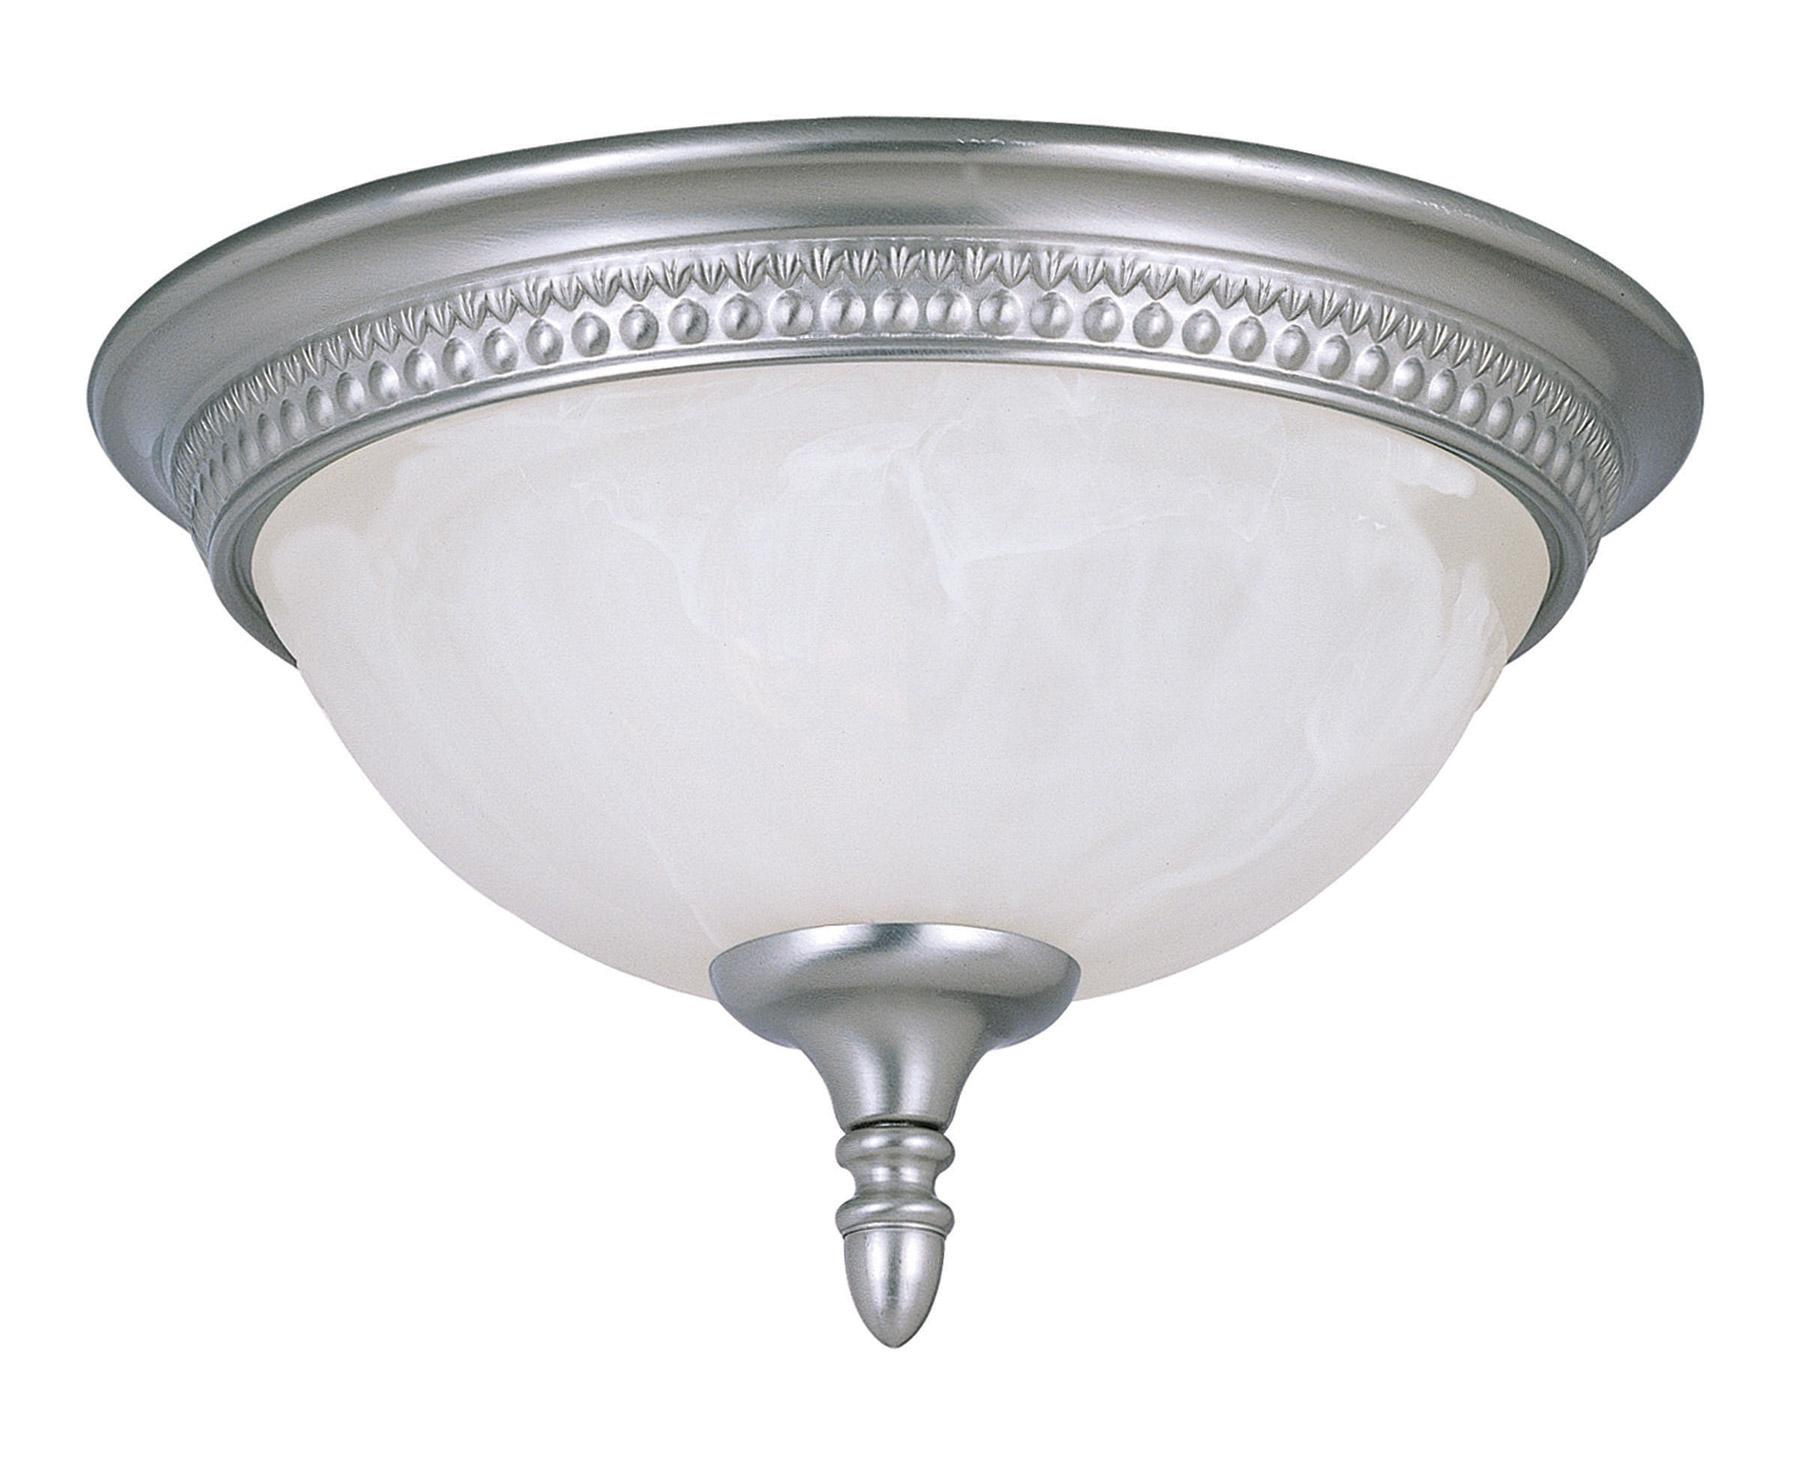 Savoy Light Fixtures House 3 4302 4 242